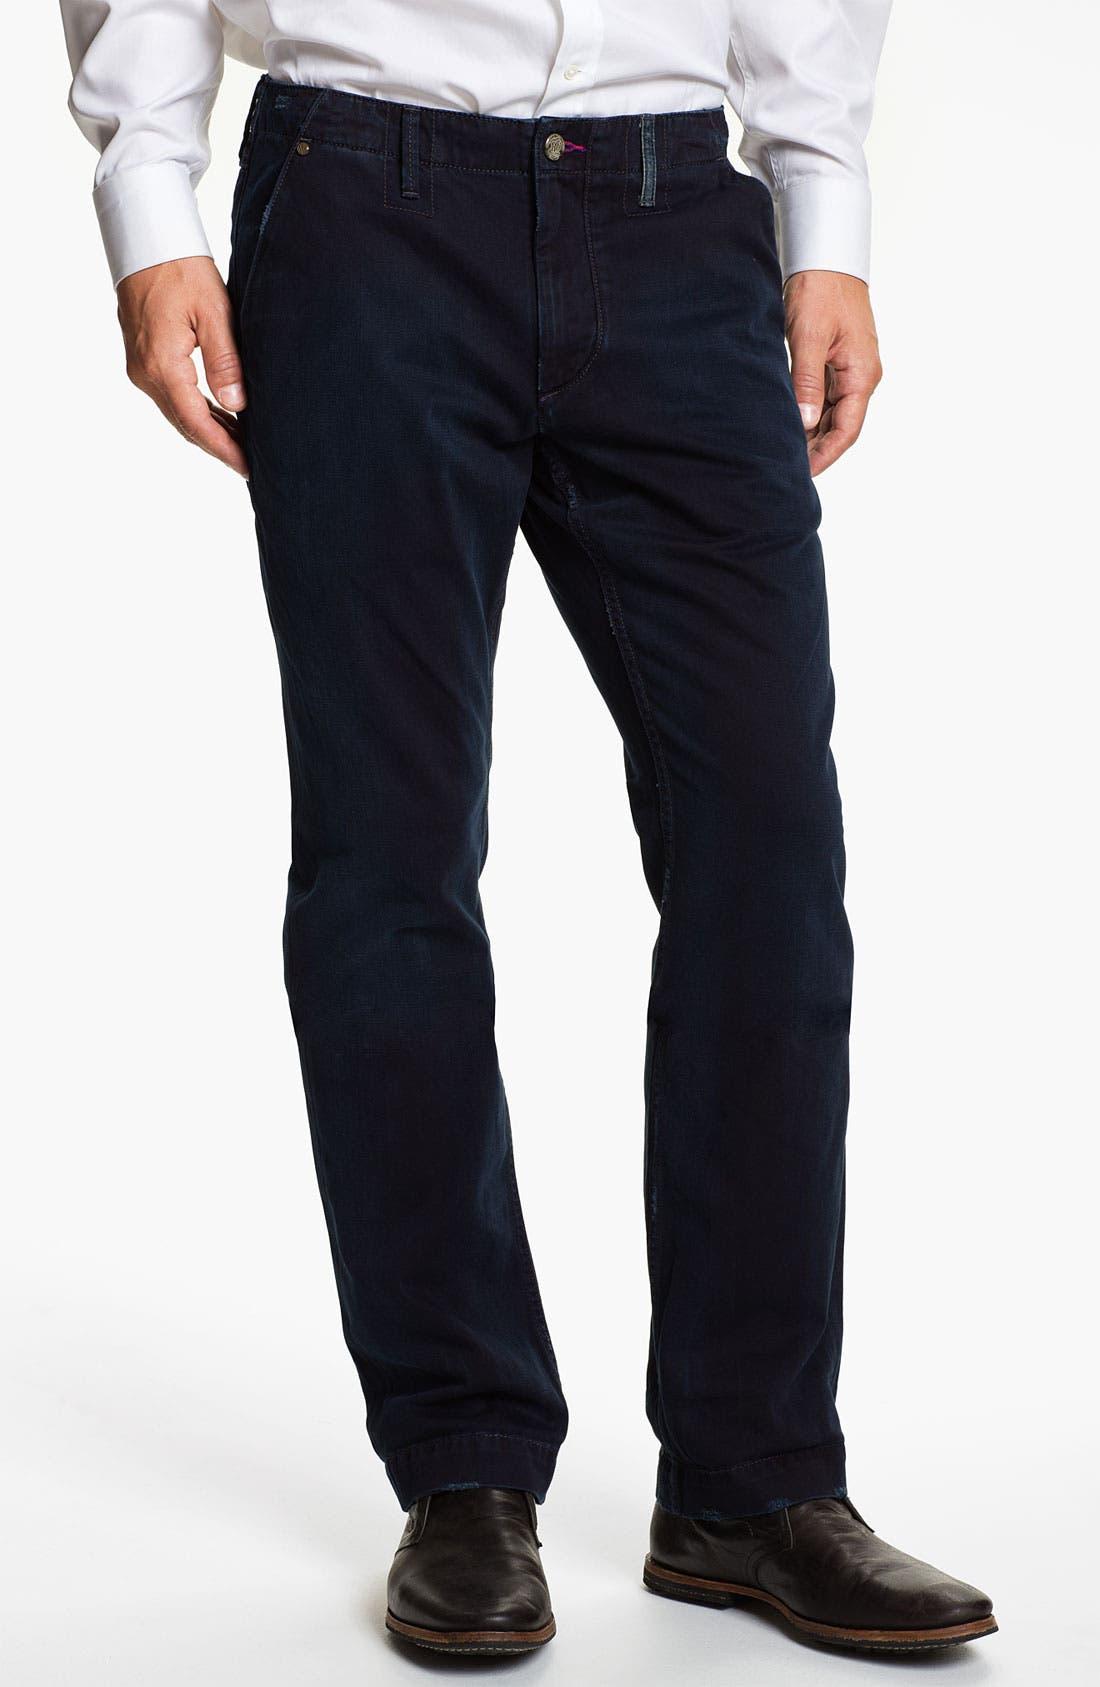 Alternate Image 1 Selected - Robert Graham Jeans 'Blue Tar' Classic Fit Straight Leg Chinos